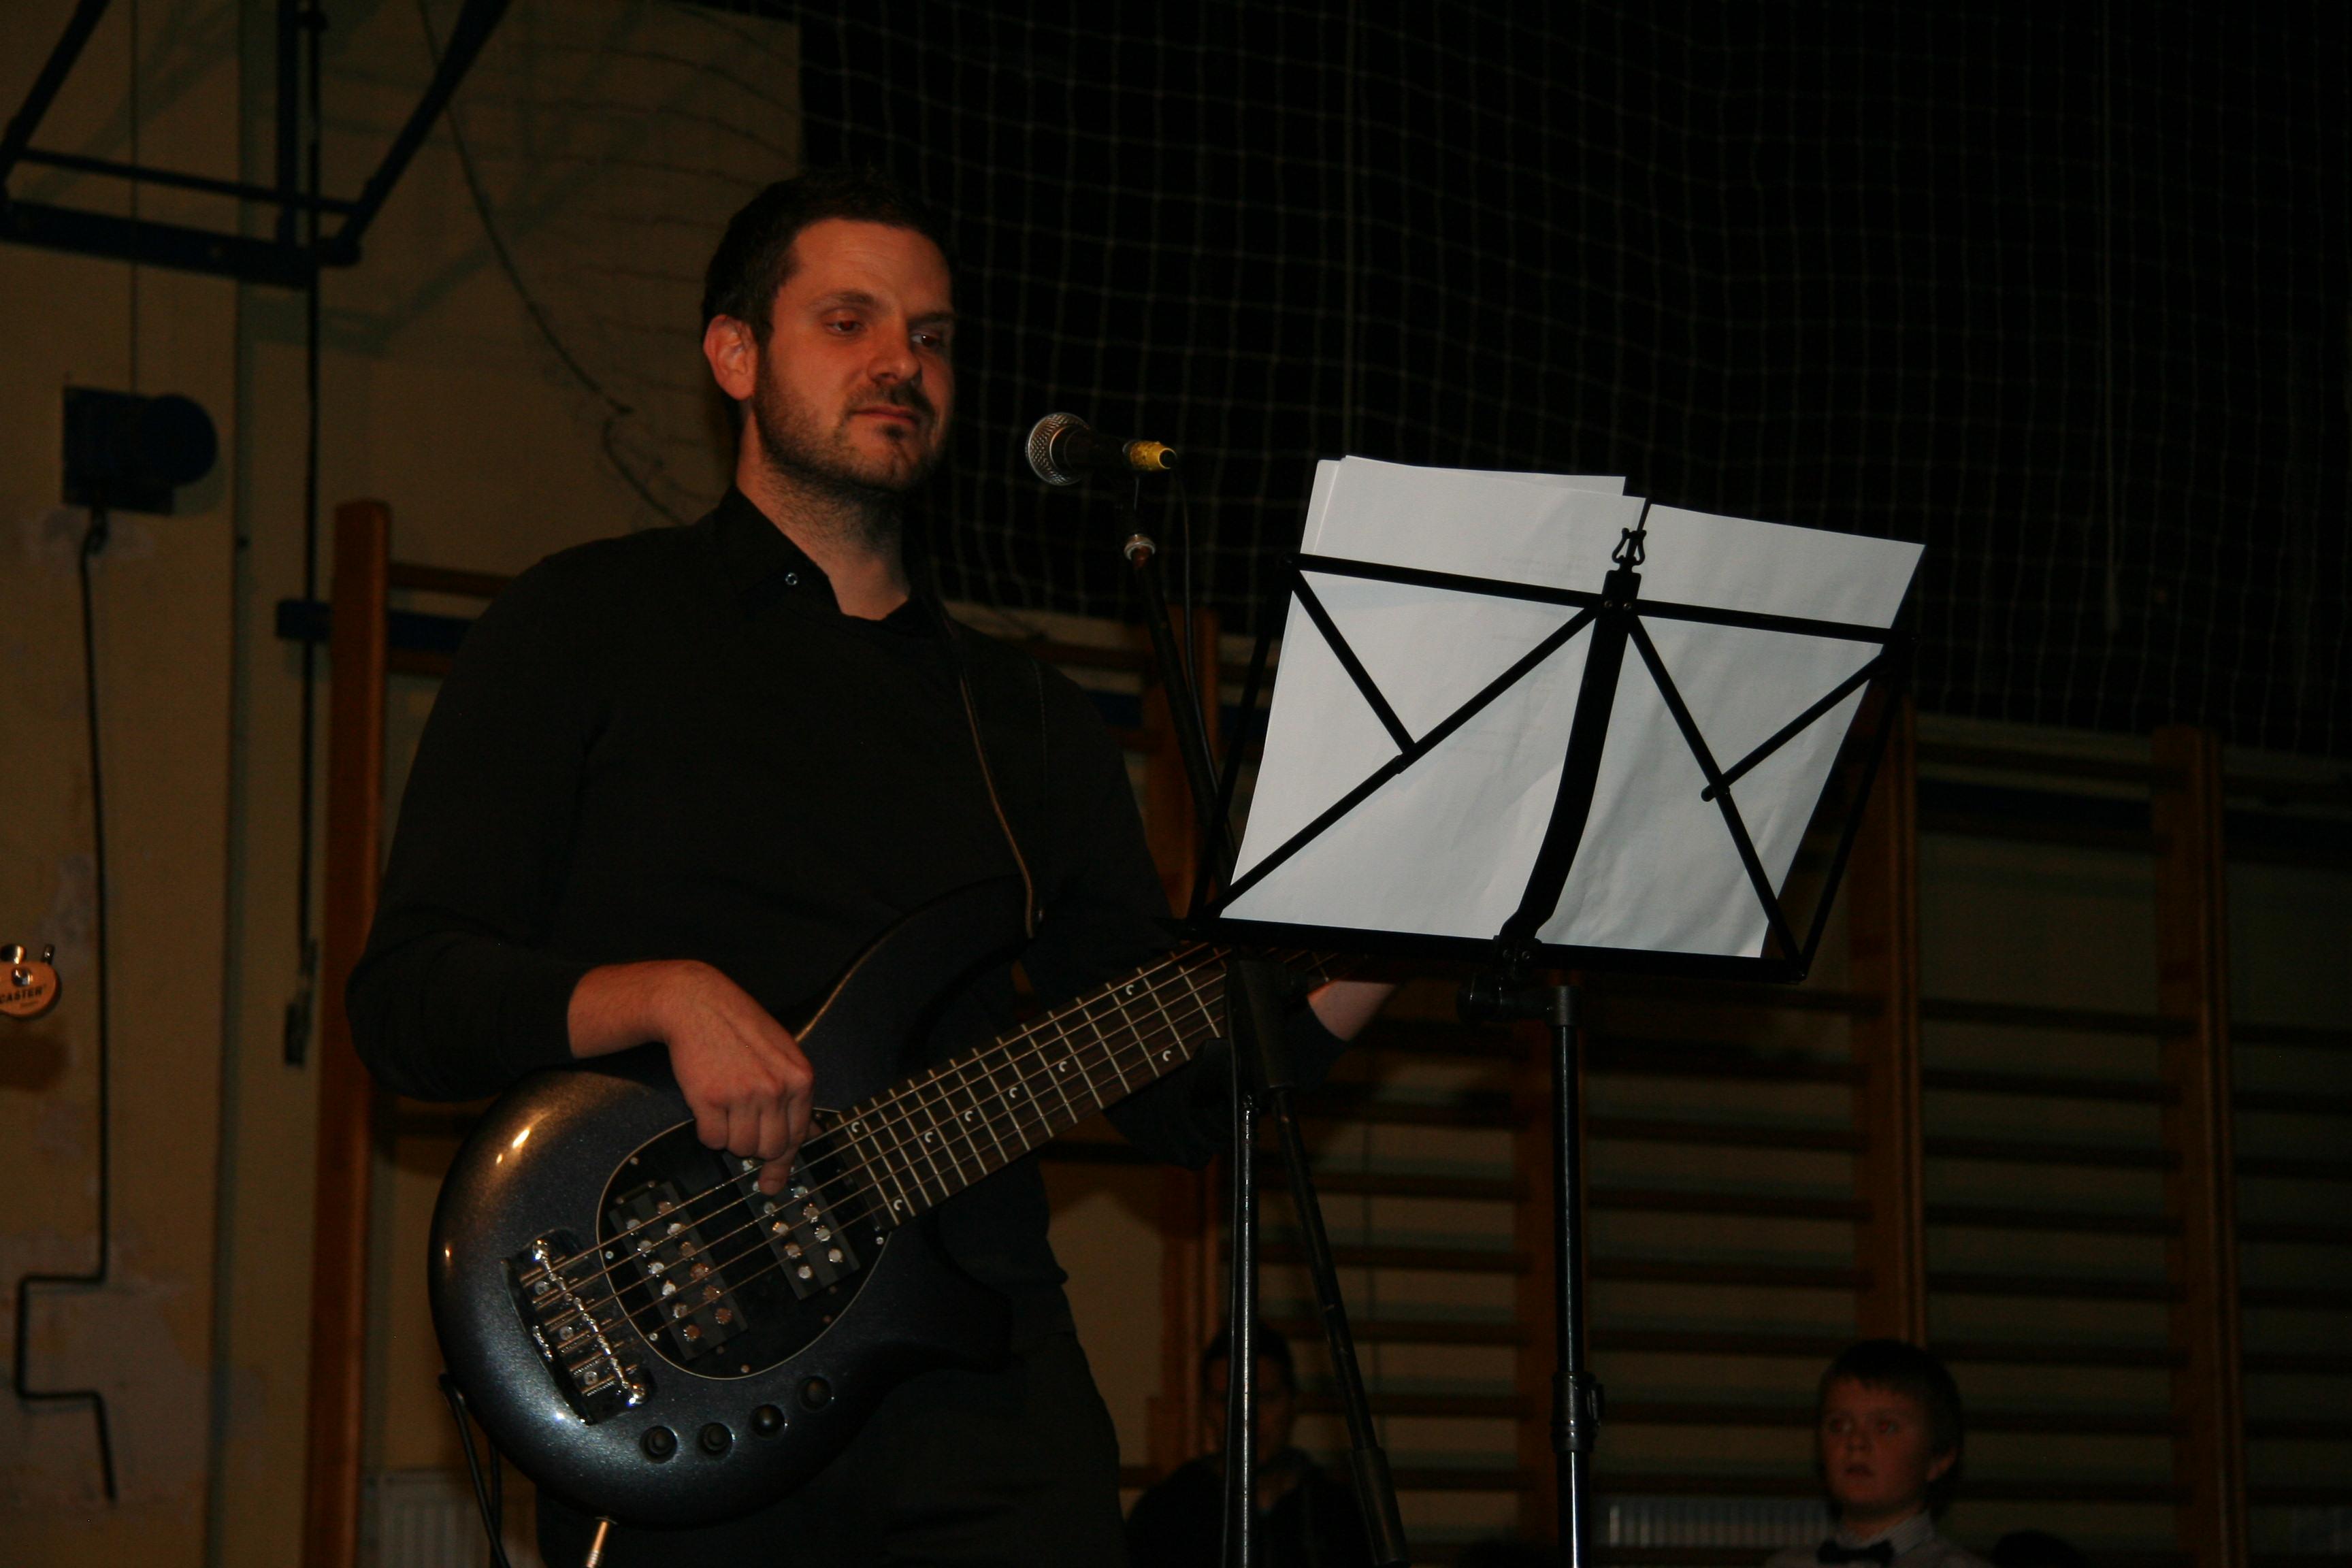 novoletno_humanitarni-koncert-2019-227